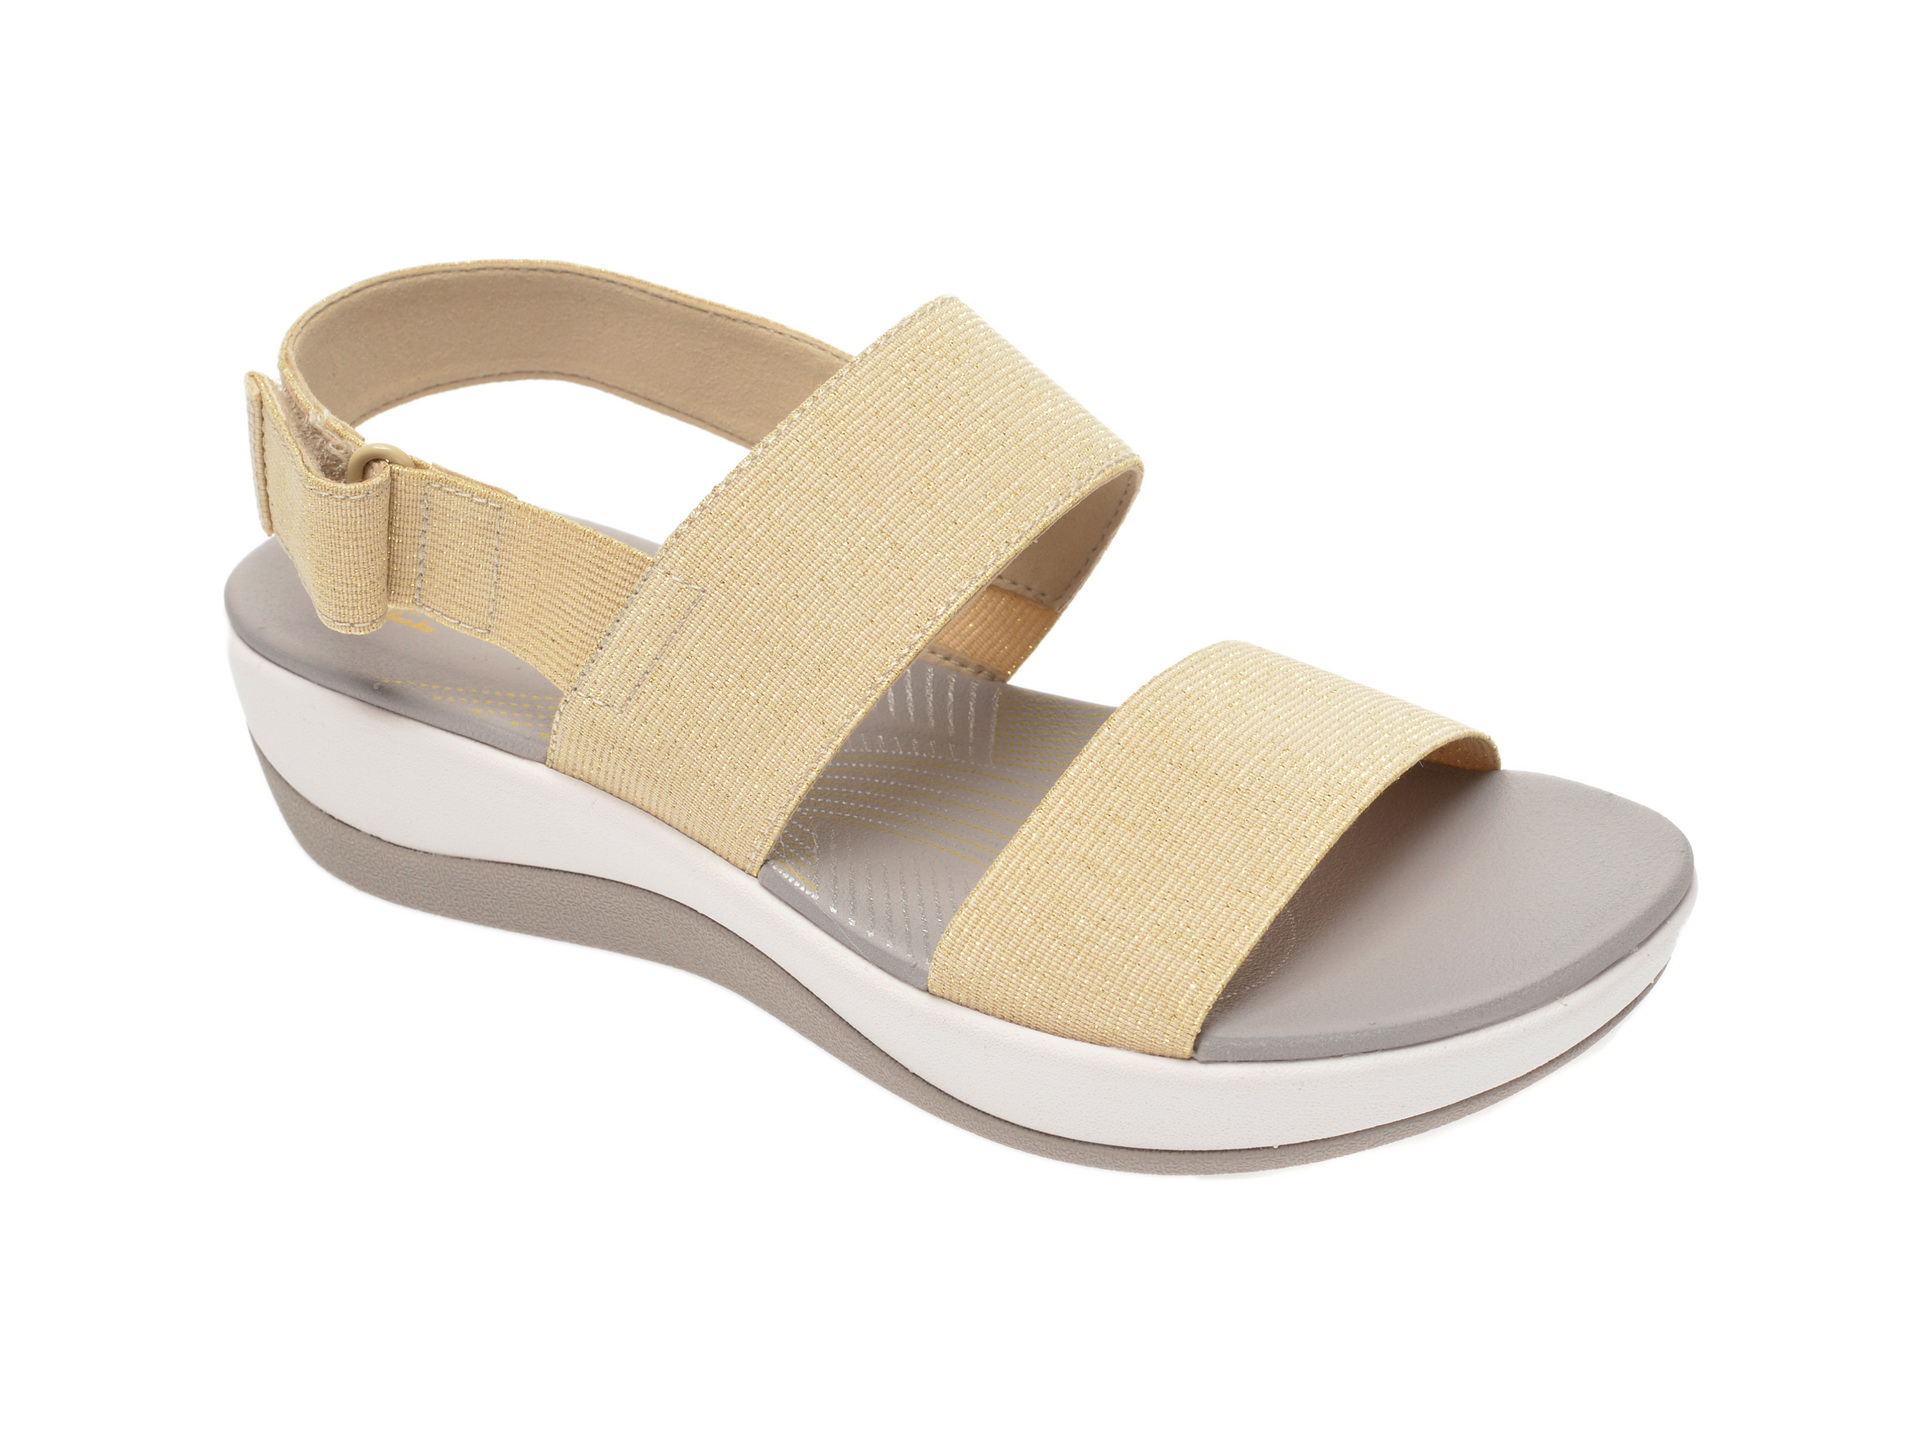 Sandale CLARKS crem, Arla Jacory, din material textil